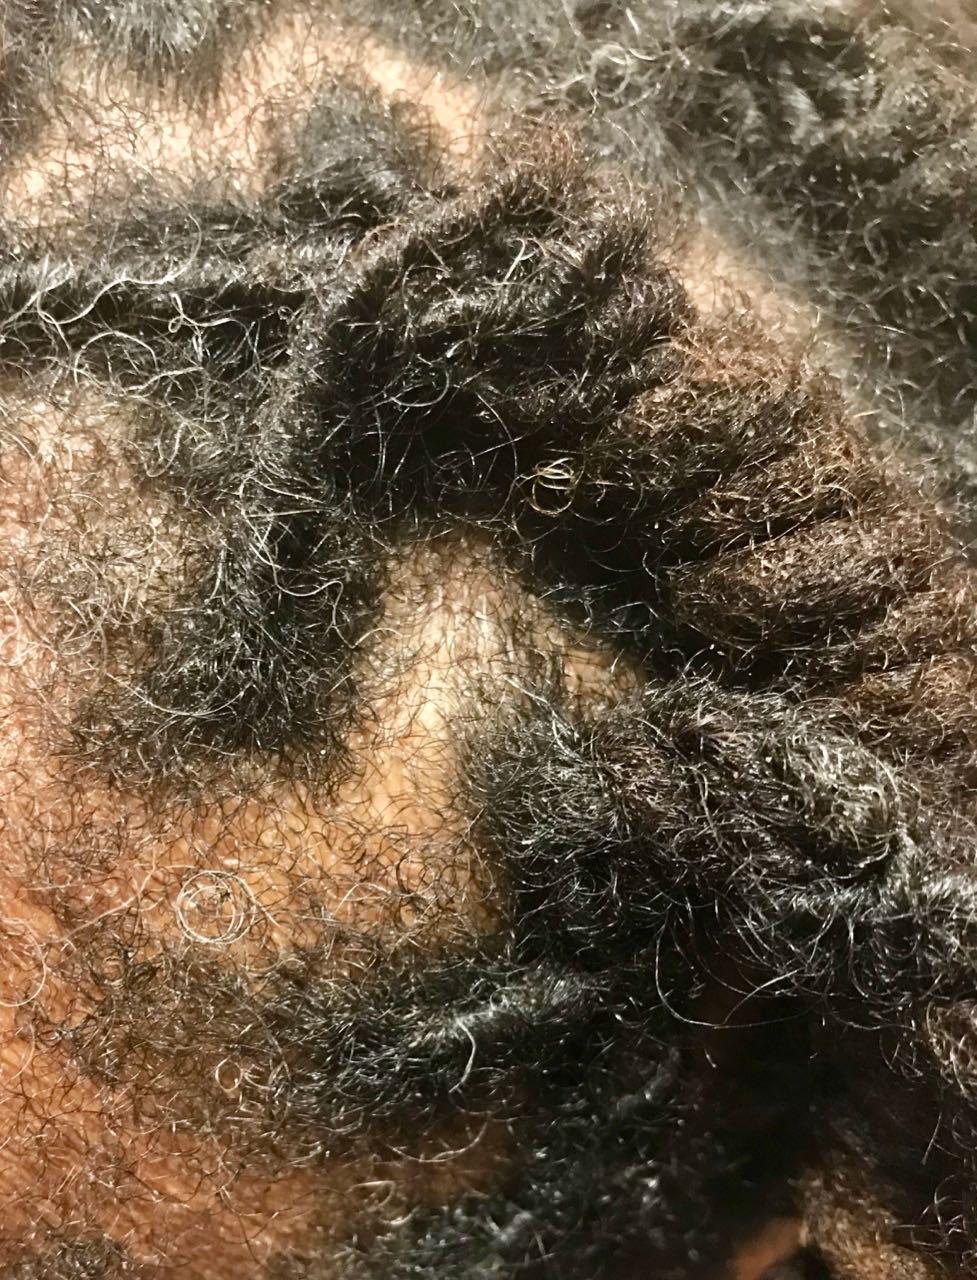 afro scalp cleansing, Afro Scalp Cleansing, Holborn Hair & Scalp Clinic